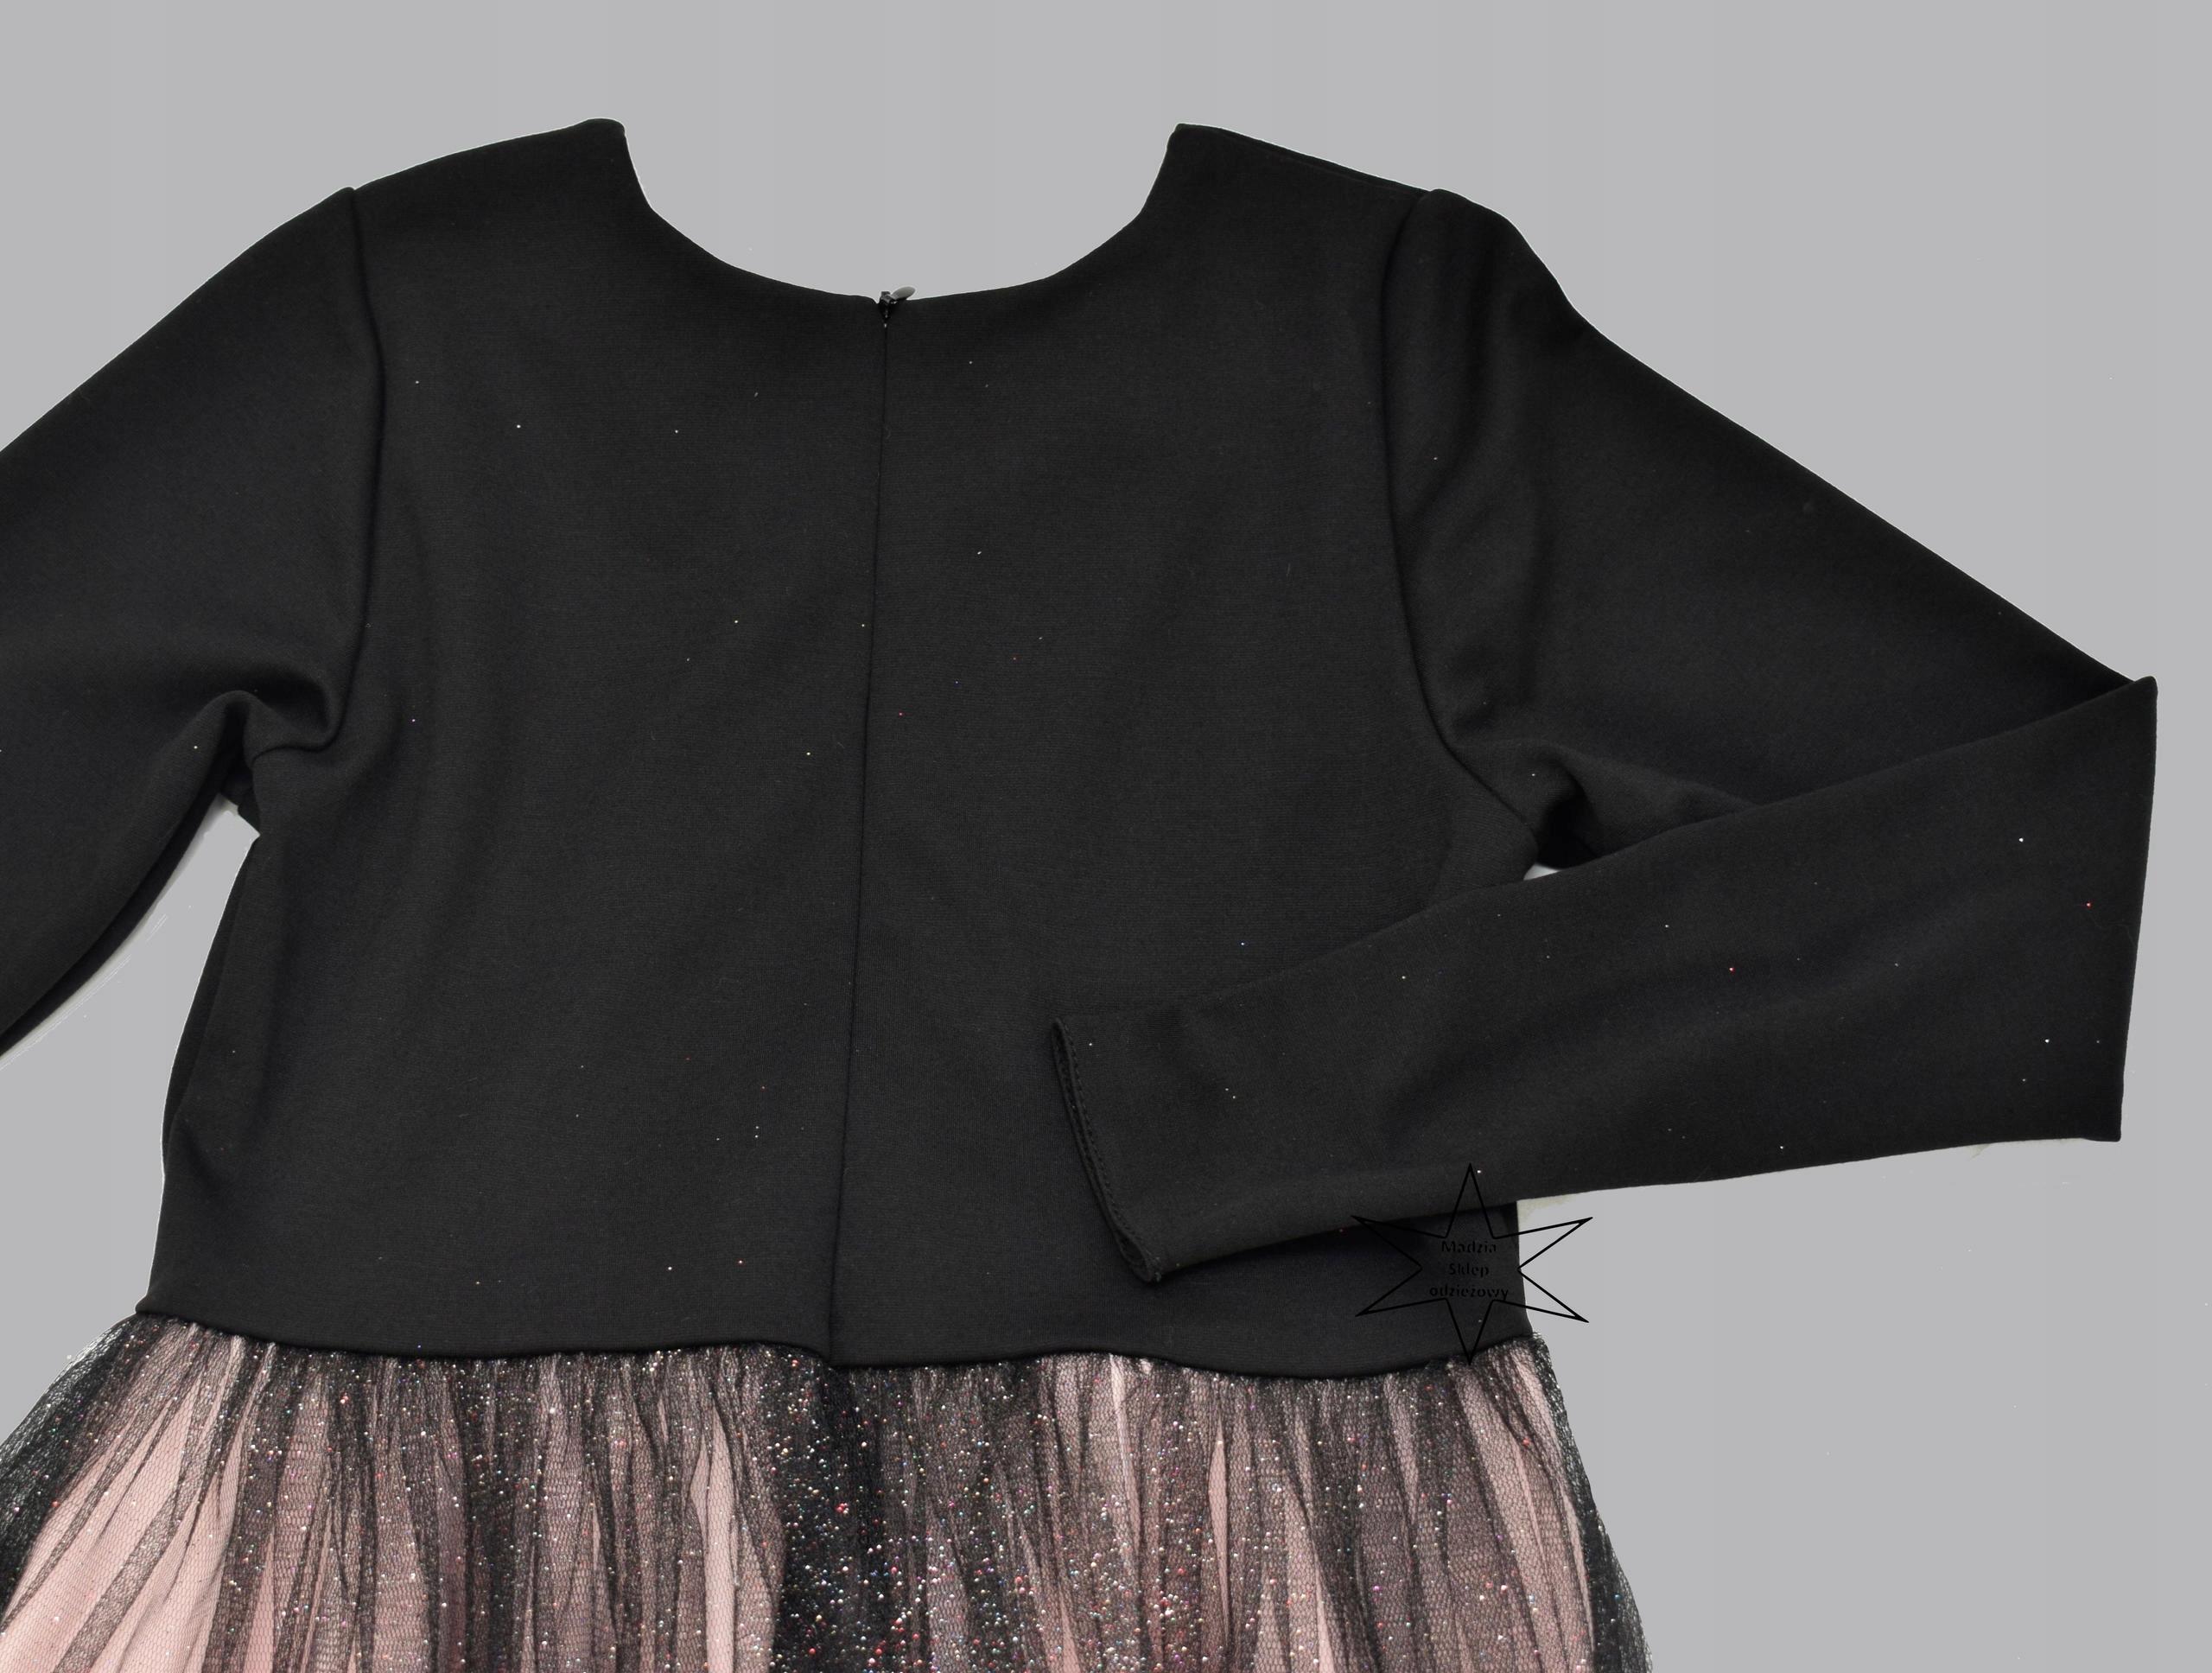 2f2a1e845c Sukienka elegancka wizytowa tiul brokat 152 - 7685571580 - oficjalne ...